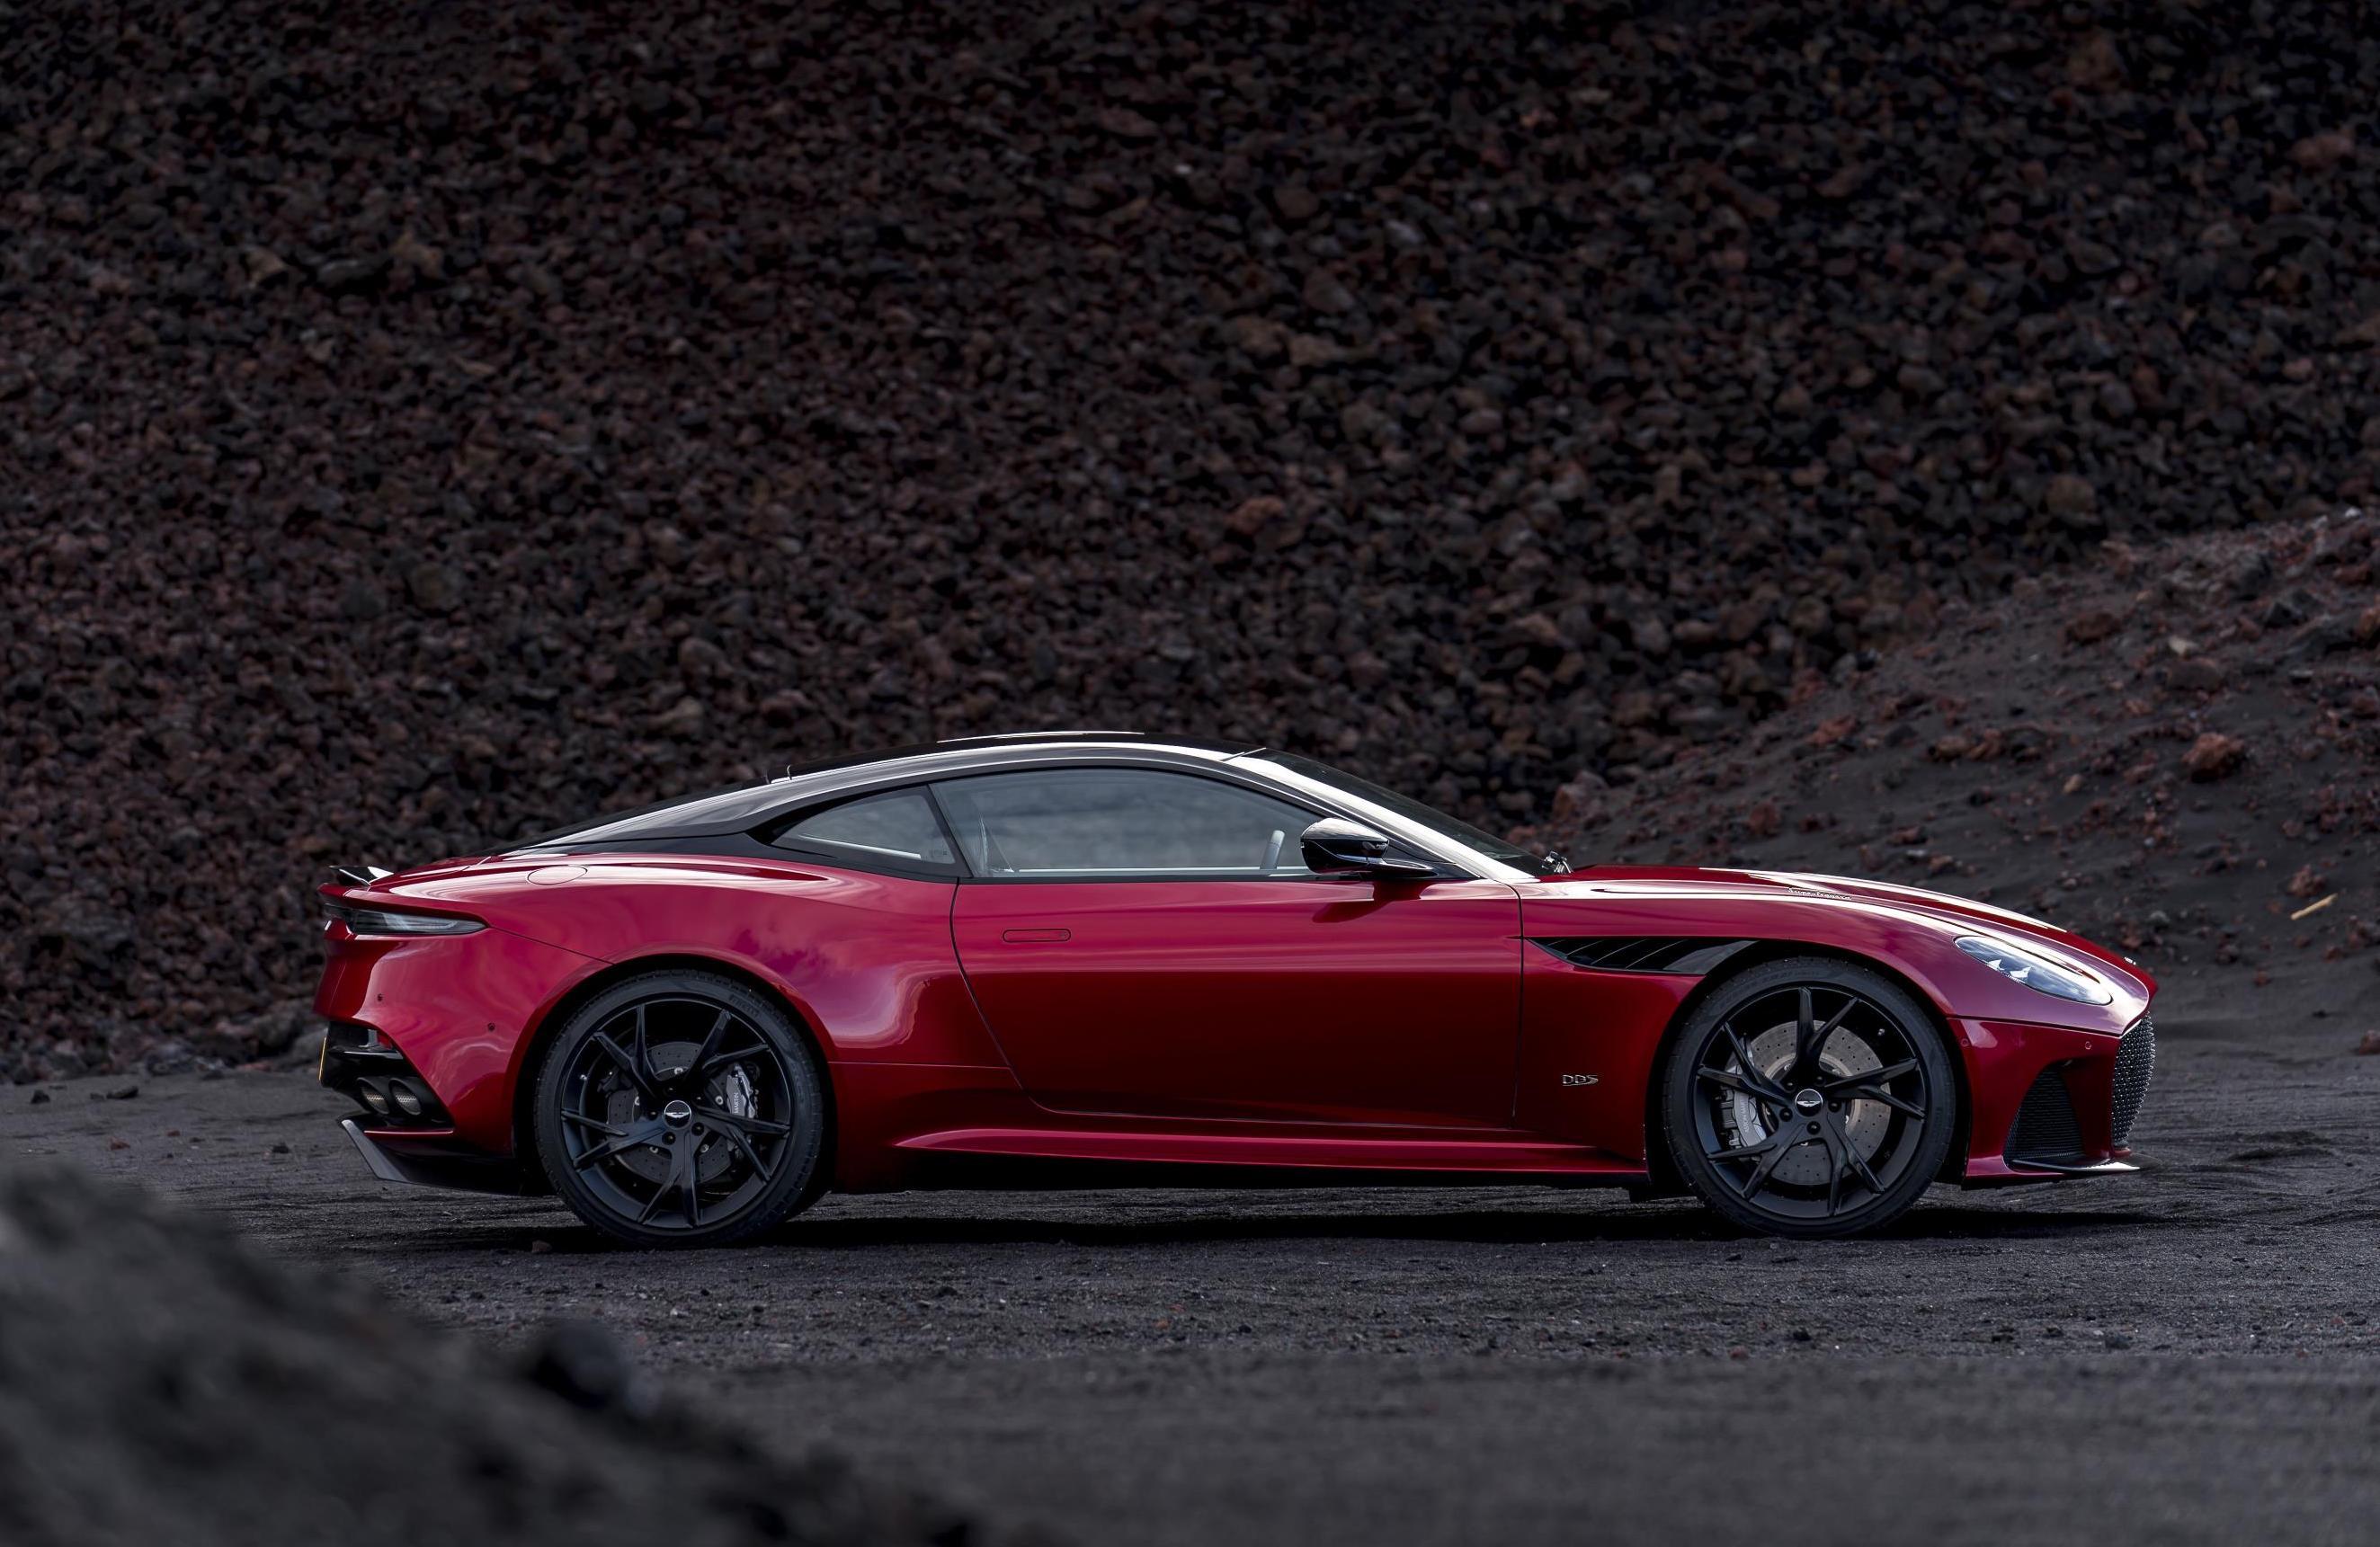 Aston Martin Dbs Superleggera Revealed Performancedrive